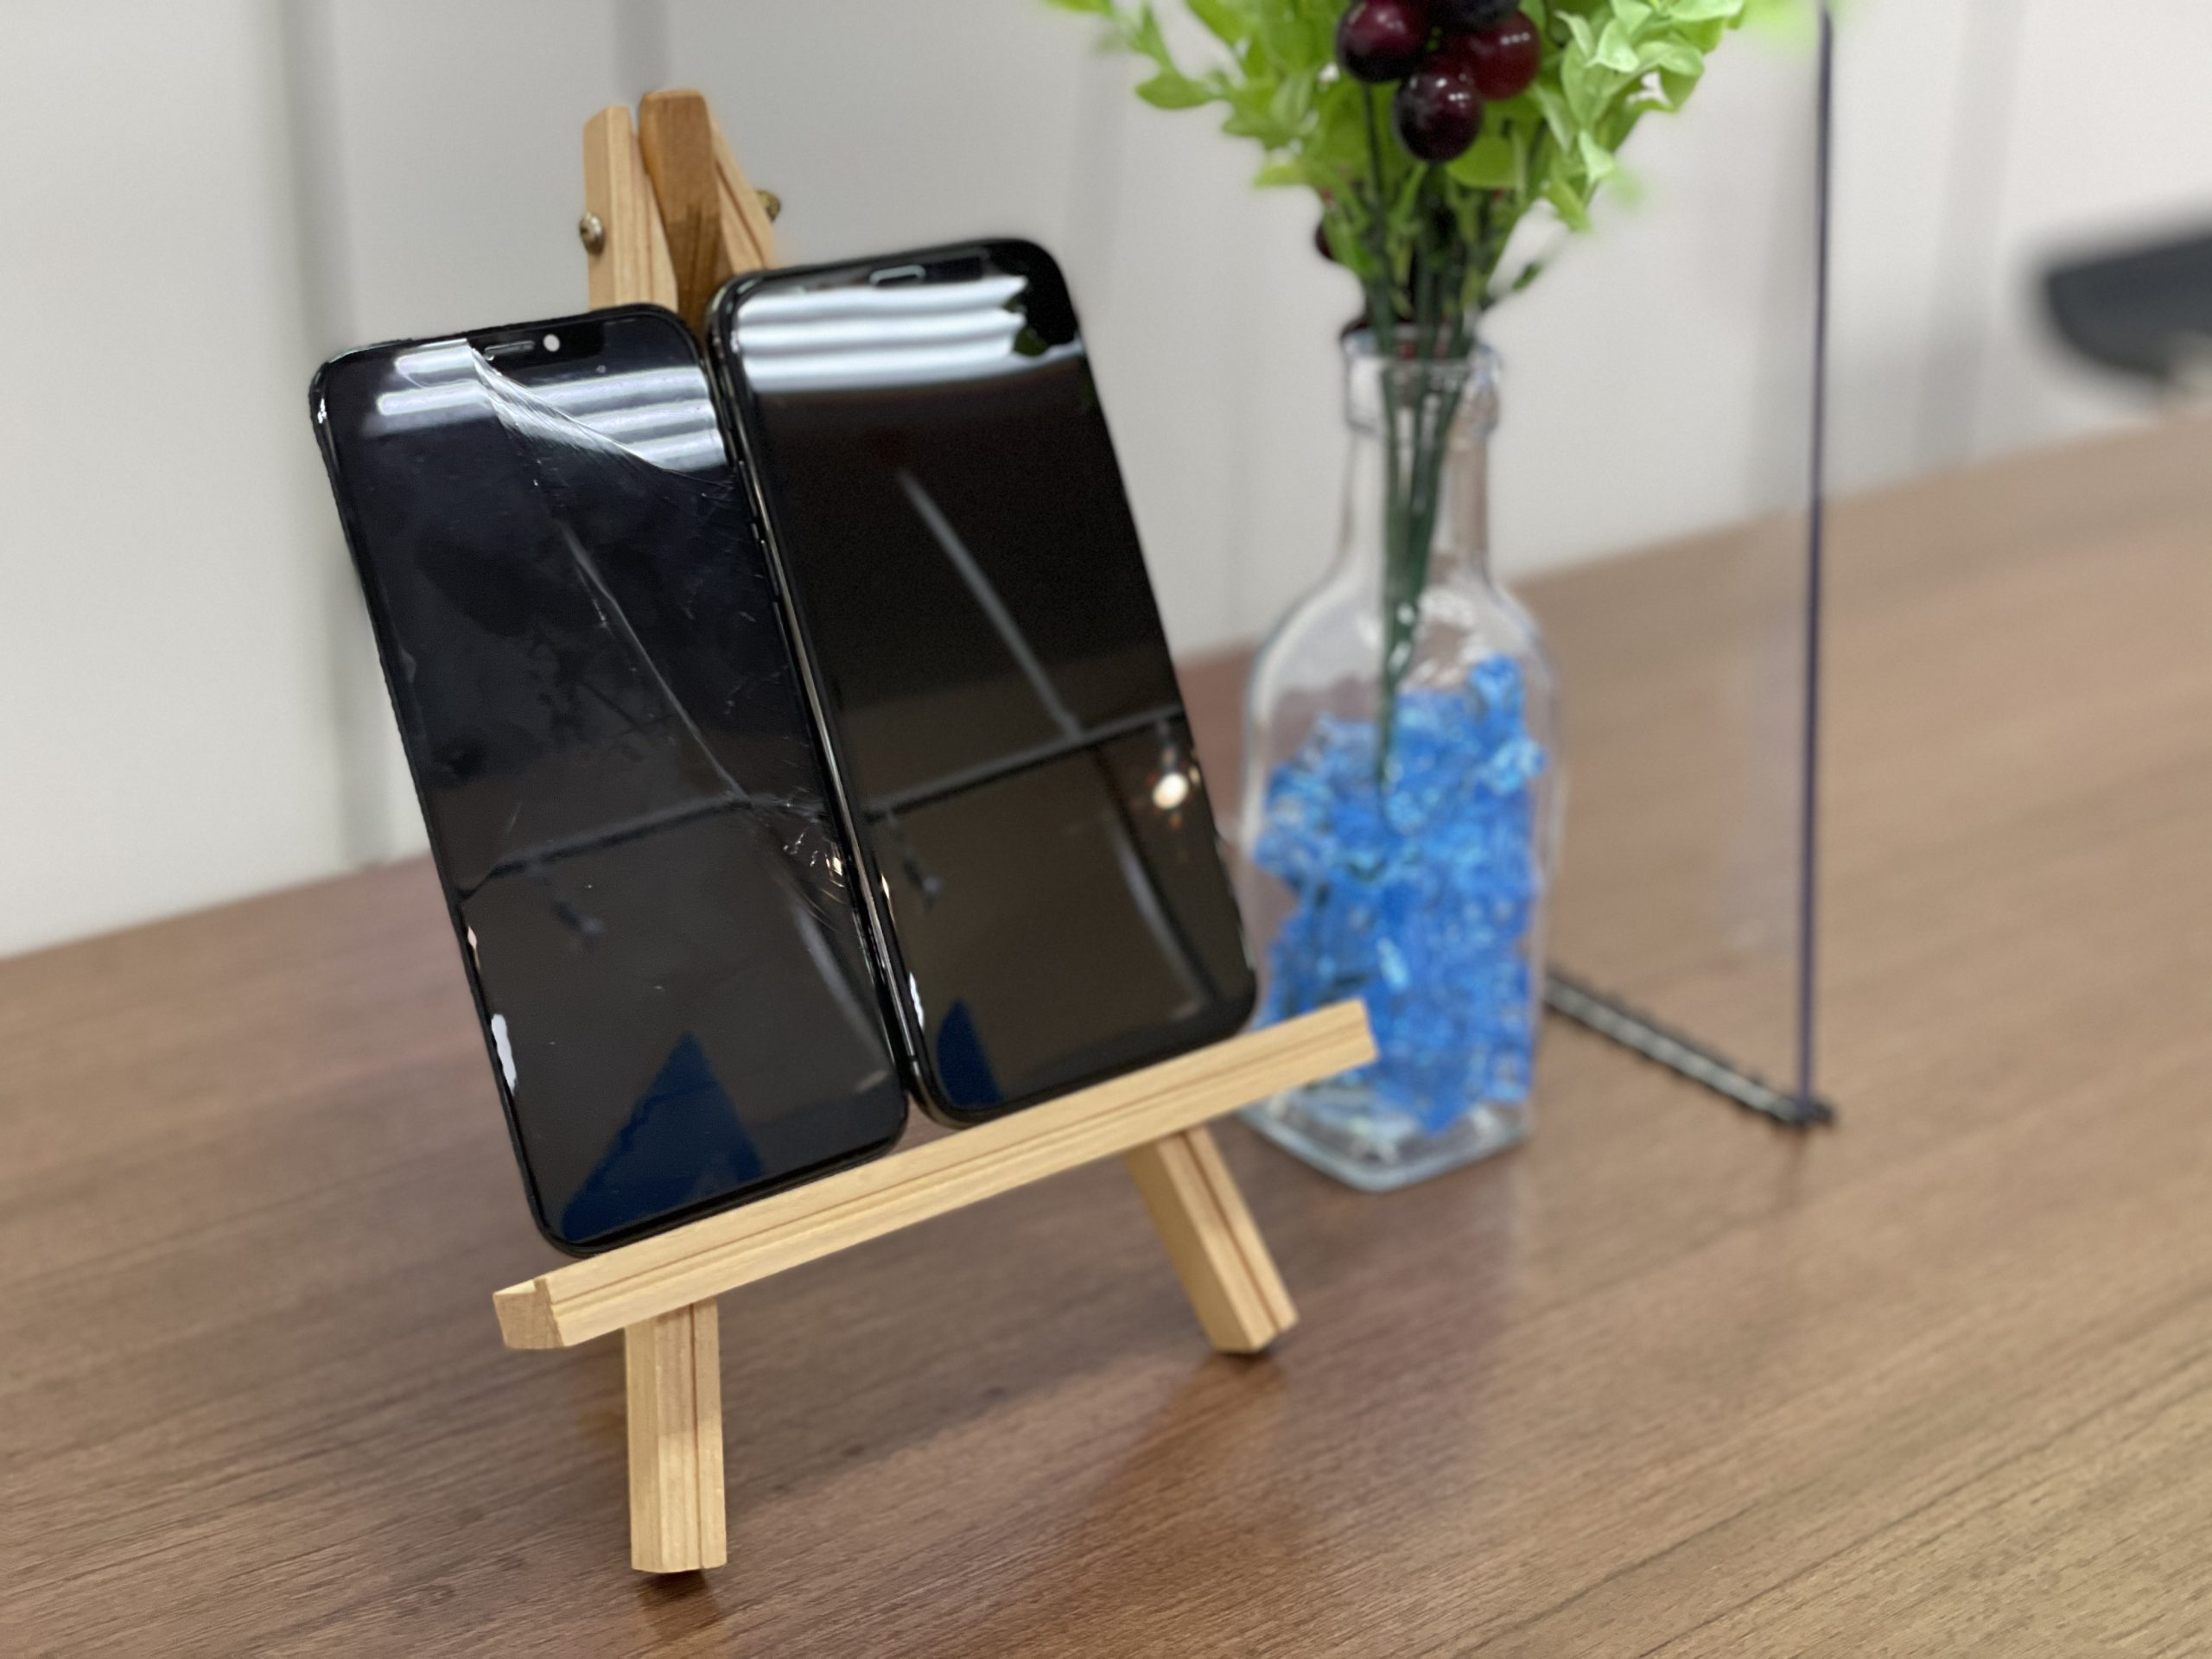 【iPhone X】画面交換即日交換!〈神埼市よりご来店〉